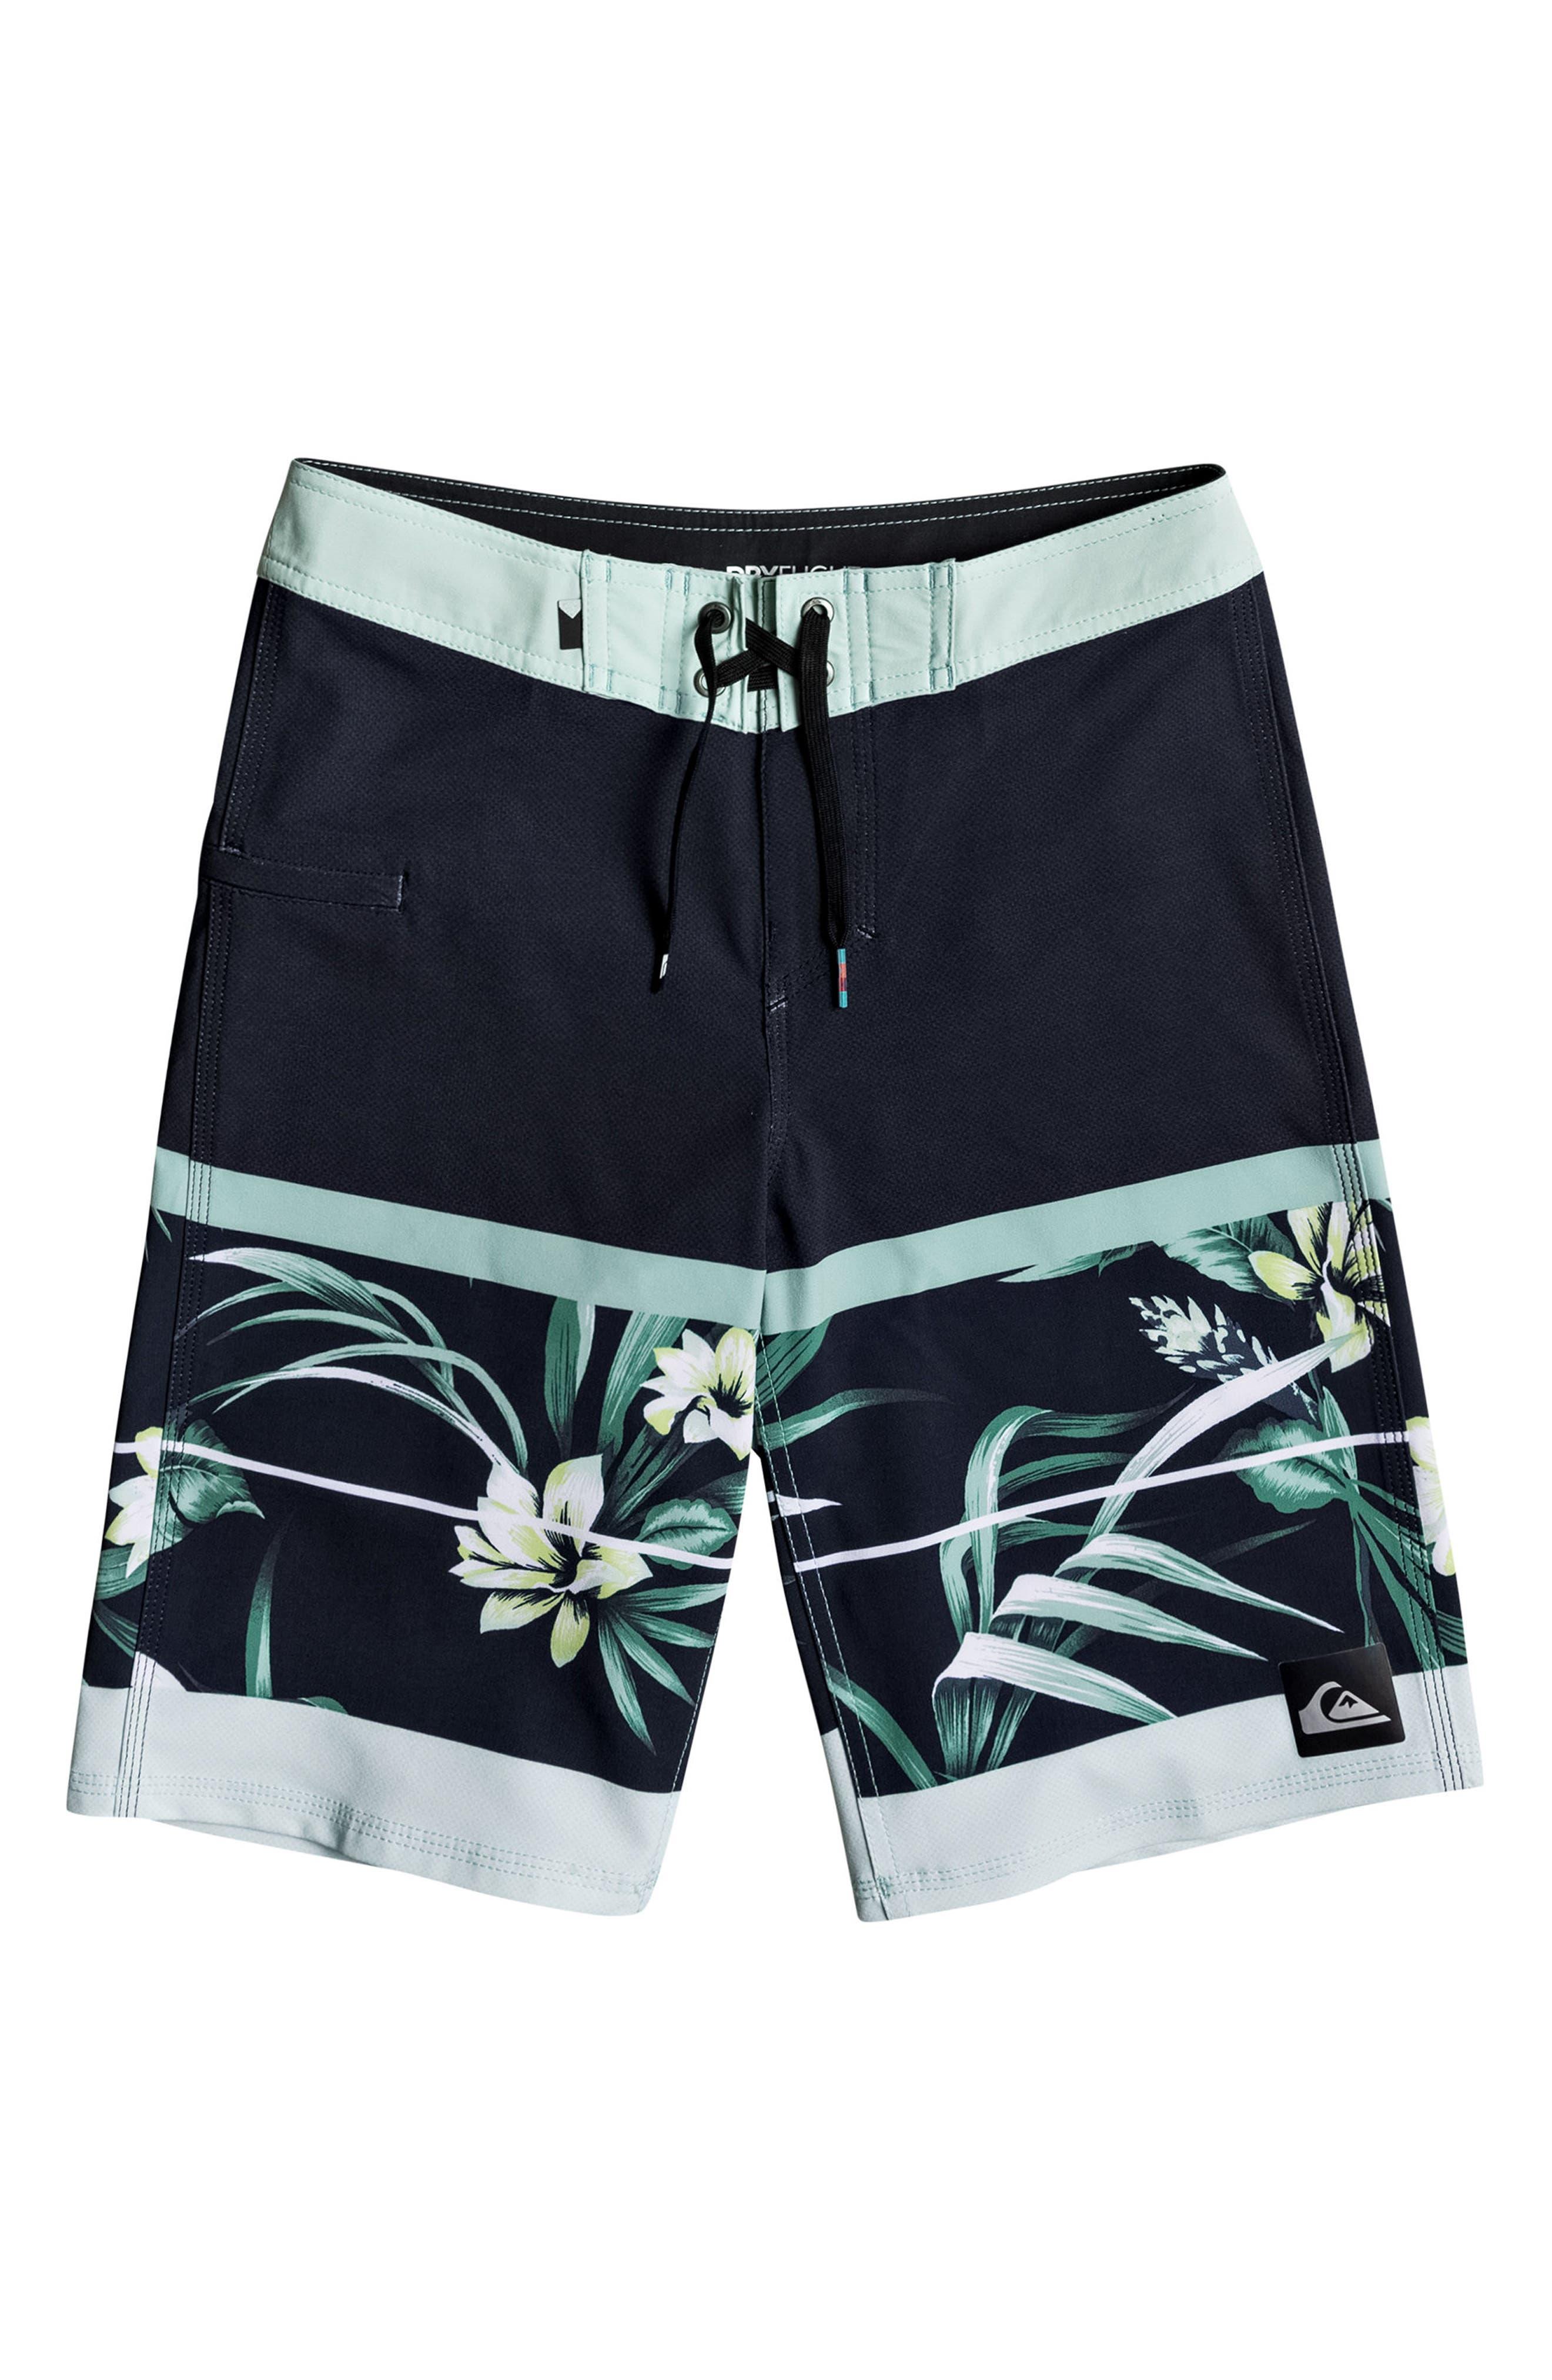 Quiksilver Slab Island Vee Board Shorts (Big Boys)